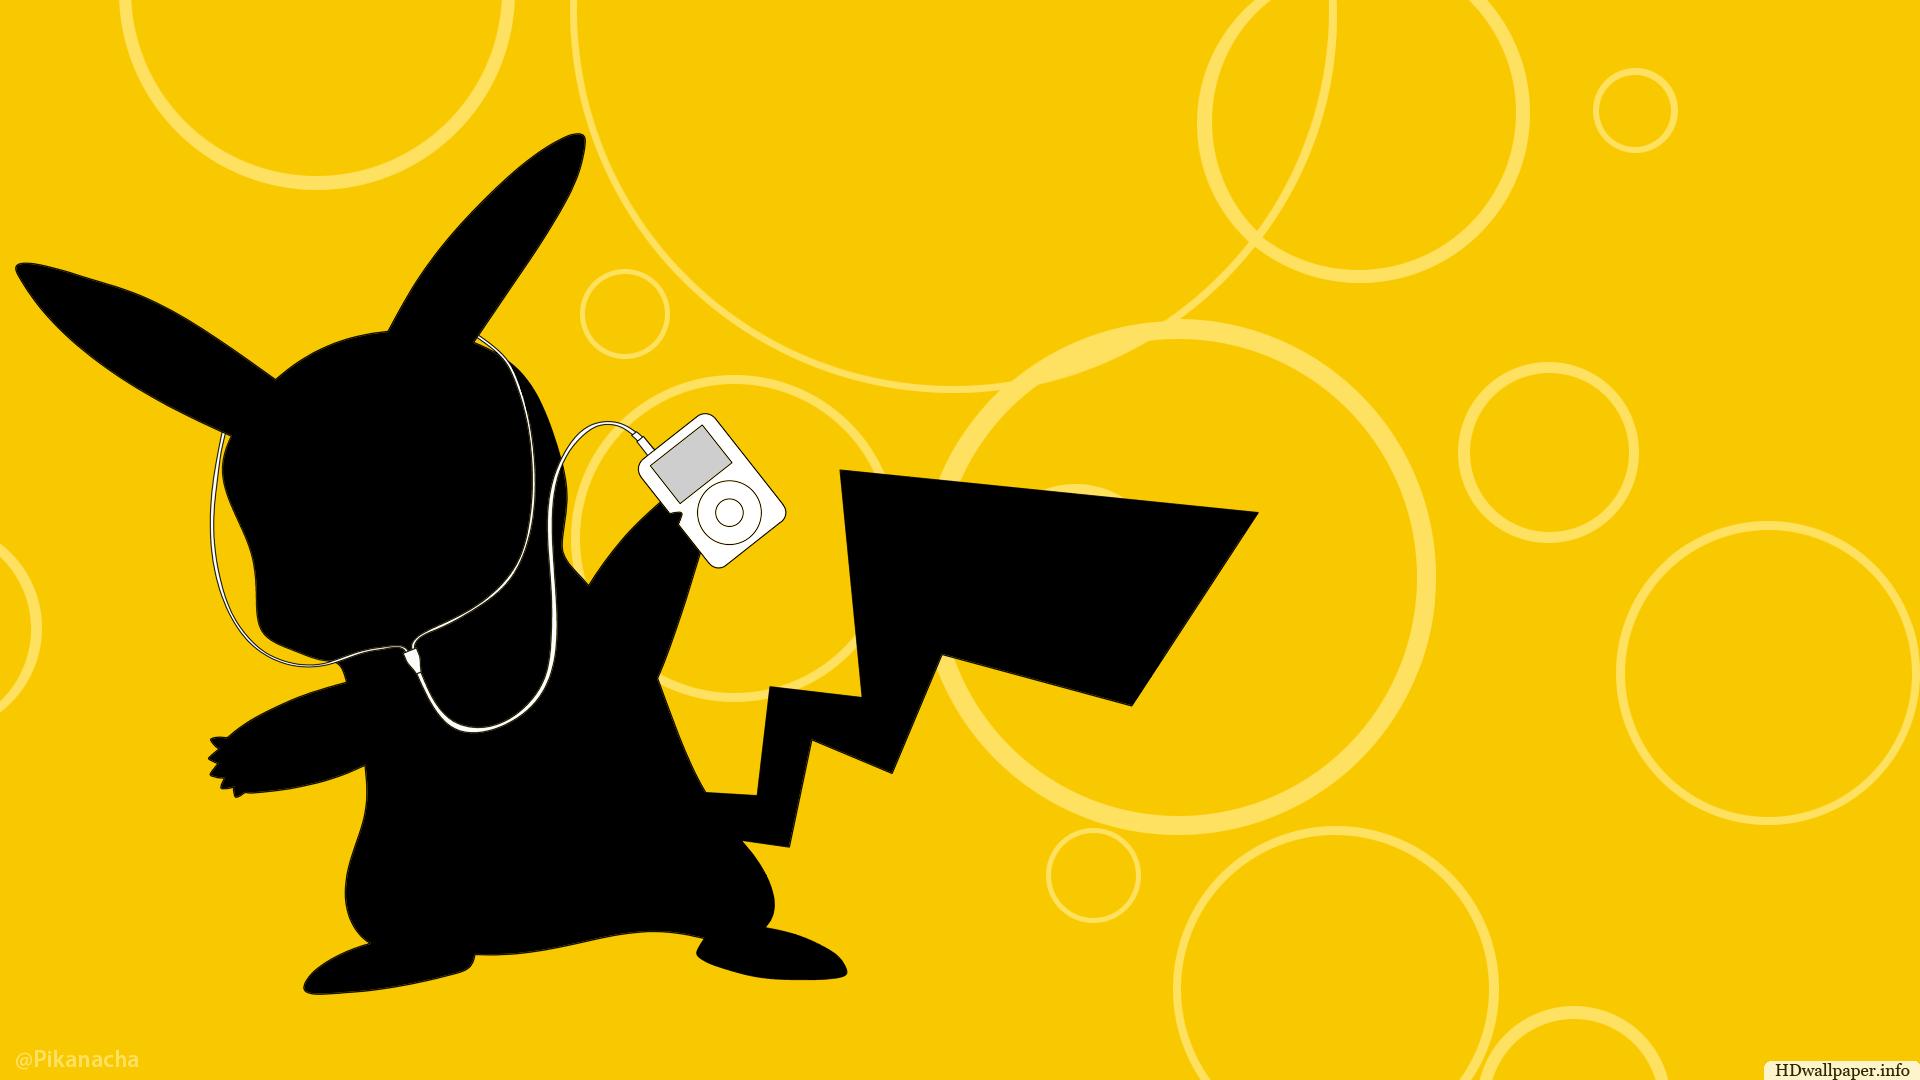 pikachu ipod wallpaper o pikachu ipod